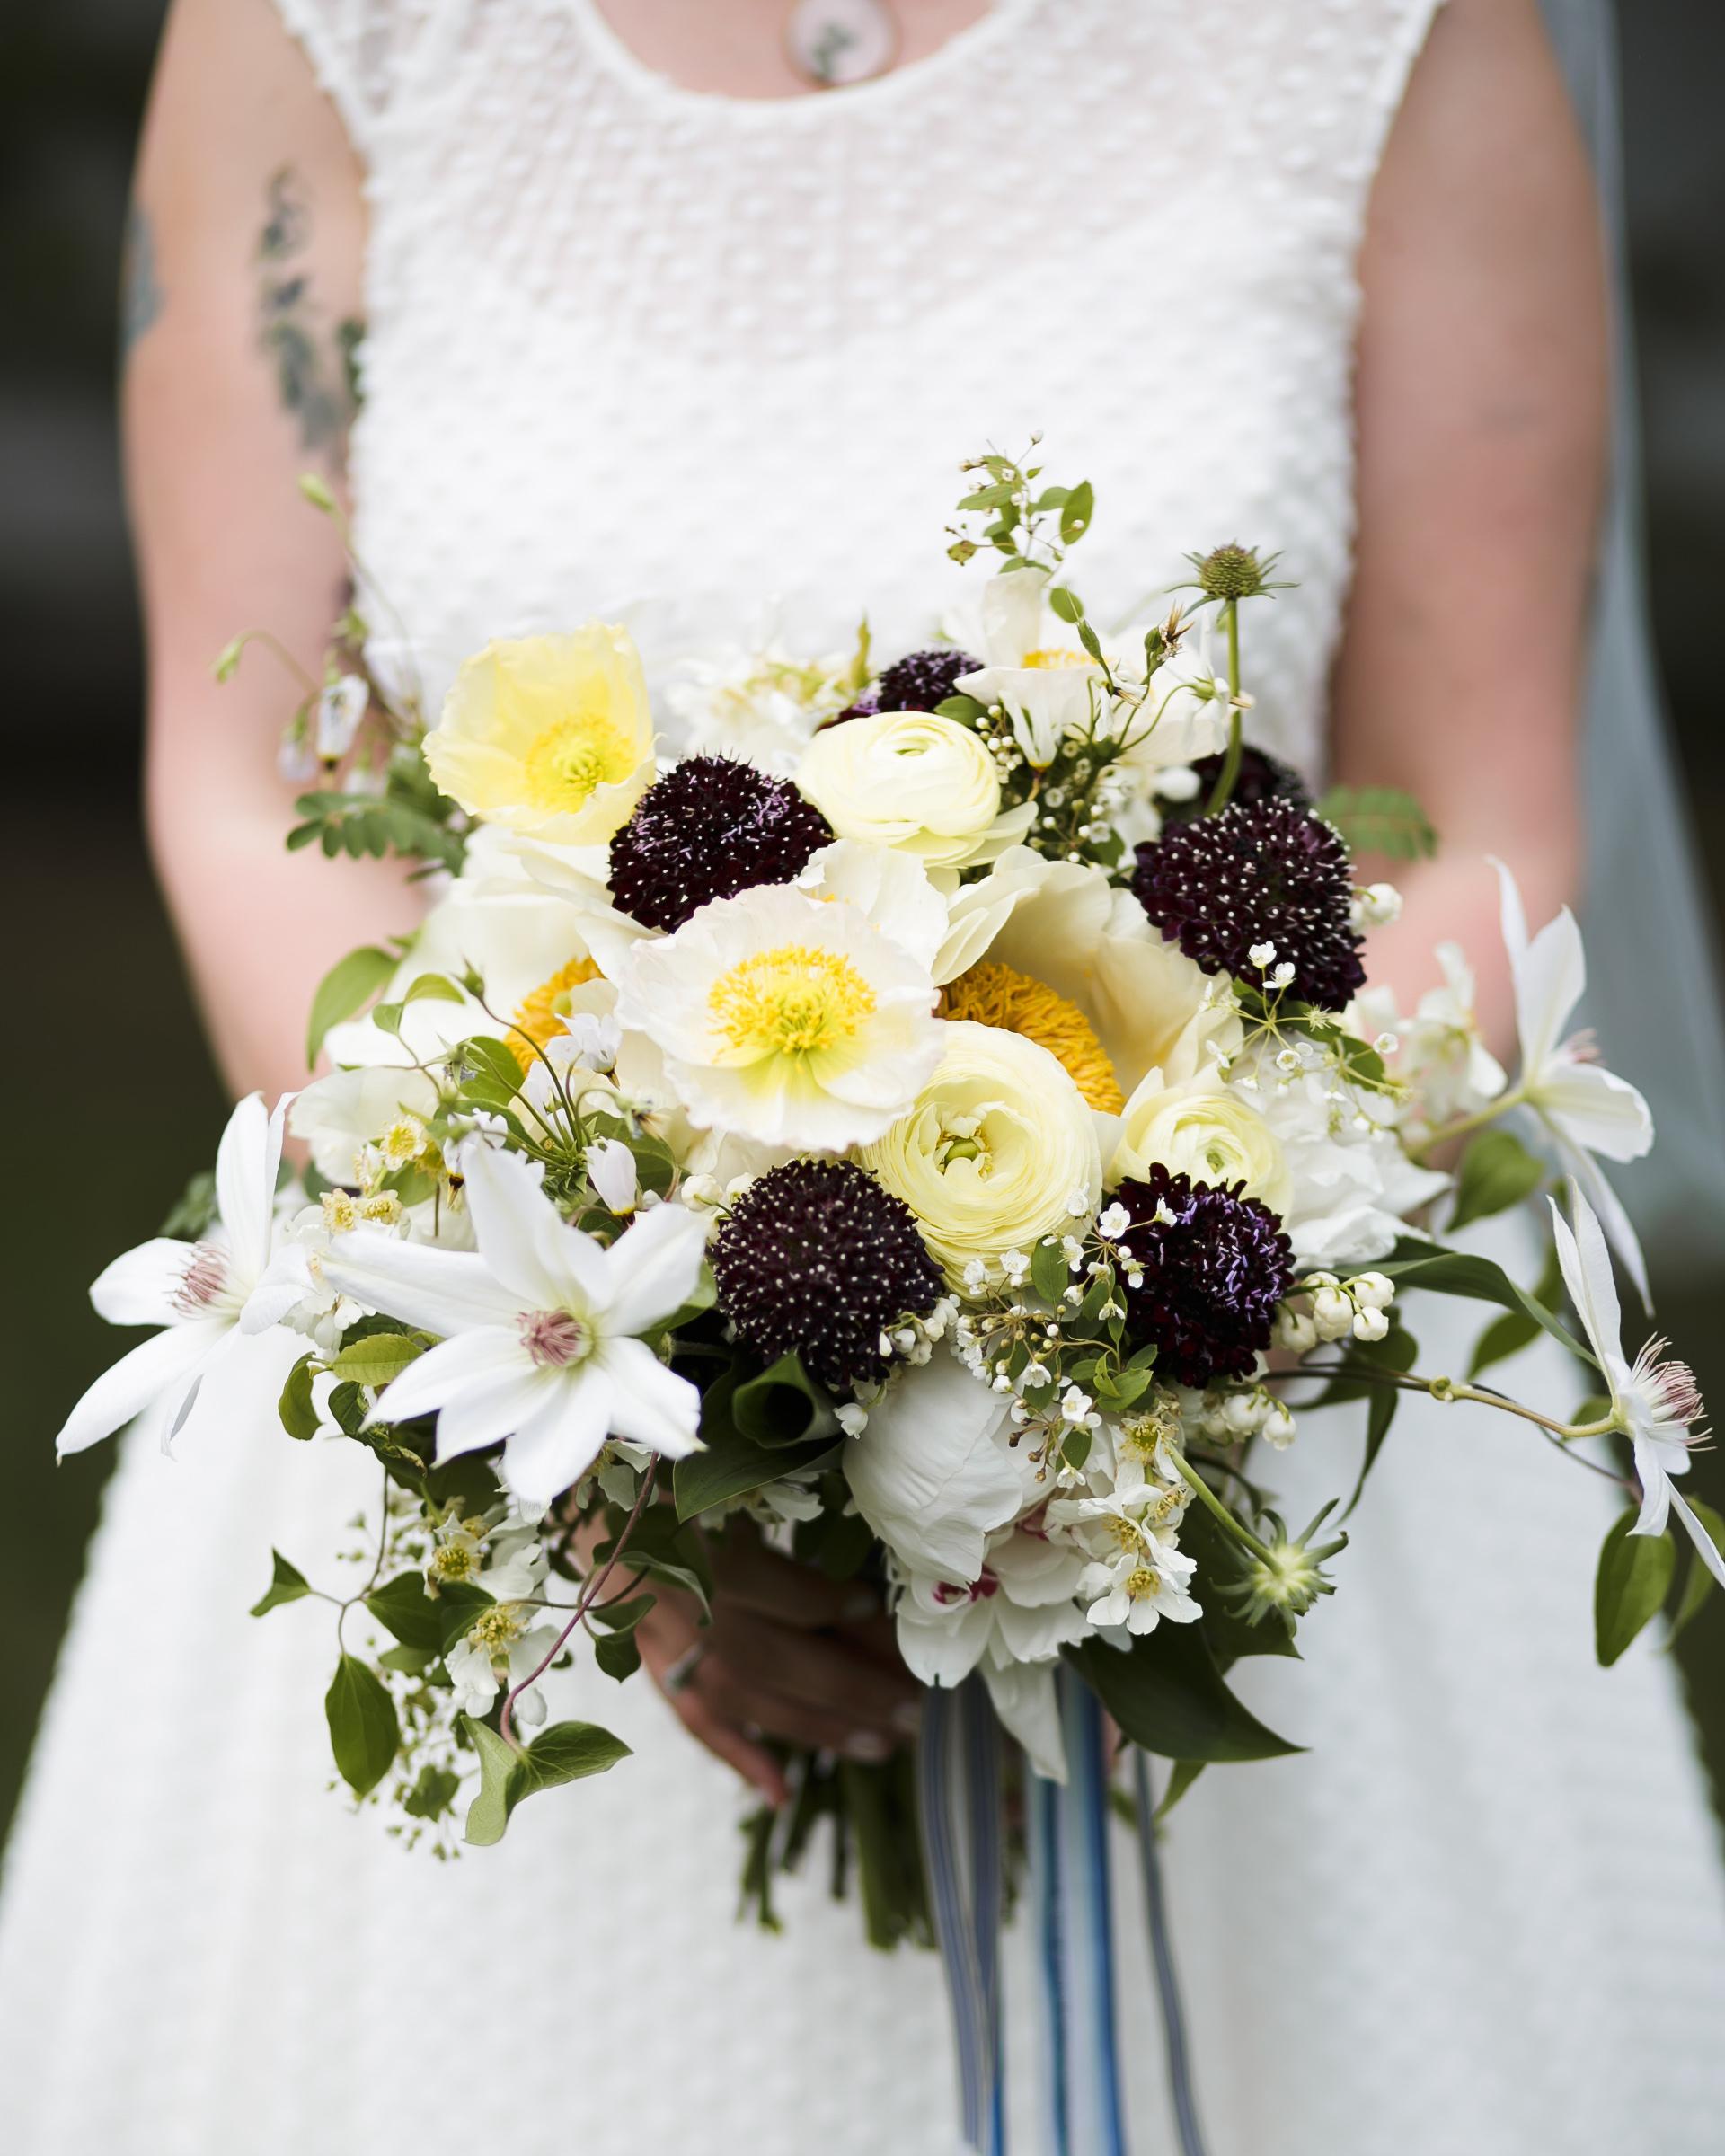 kelly-marie-dave-wedding-bouquet1-0414.jpg